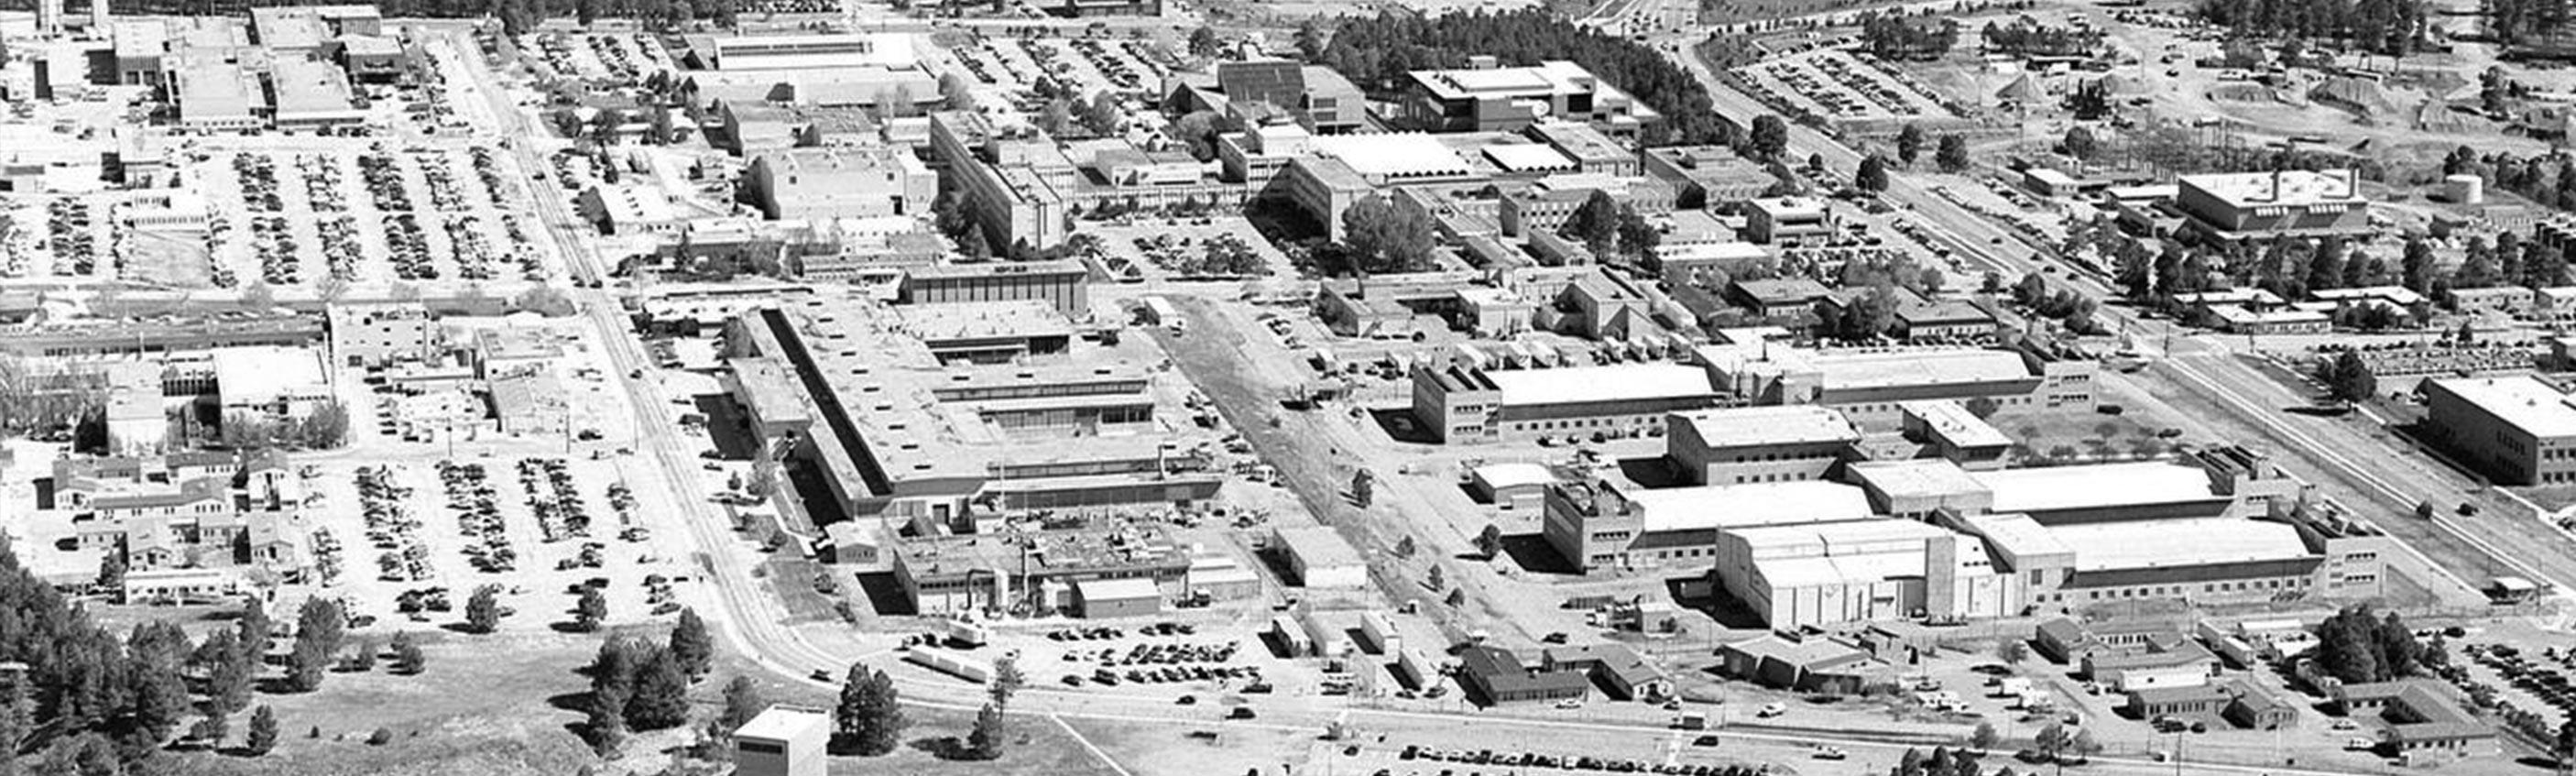 Los Alamos National Laboratory (New Mexico) - Cold War Patriots